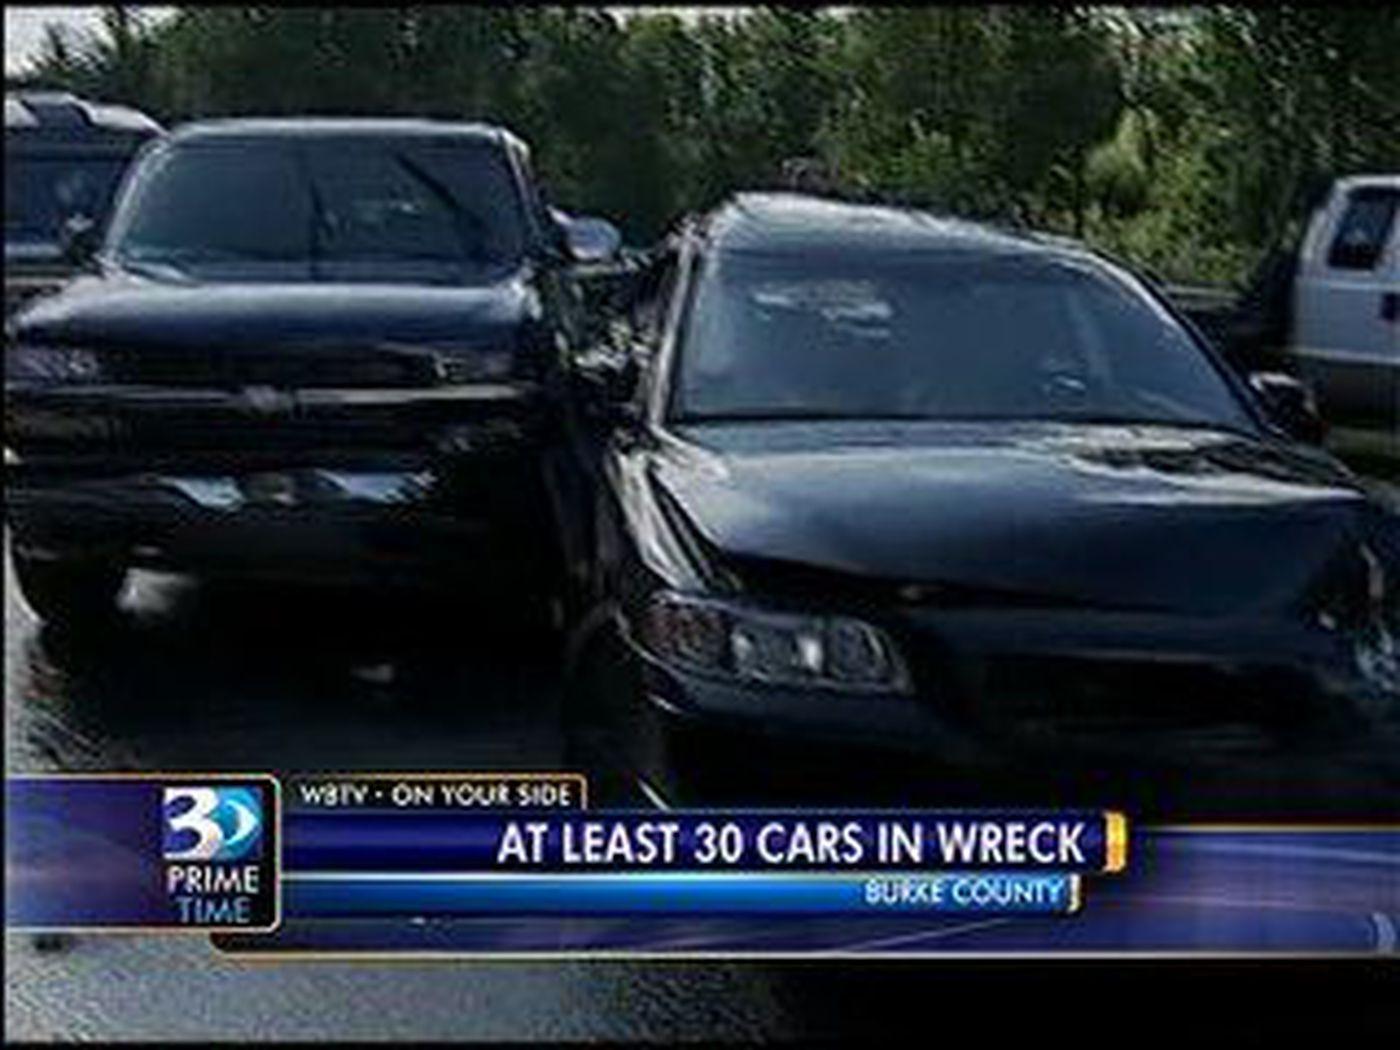 I40 east closes due to 30 car crash